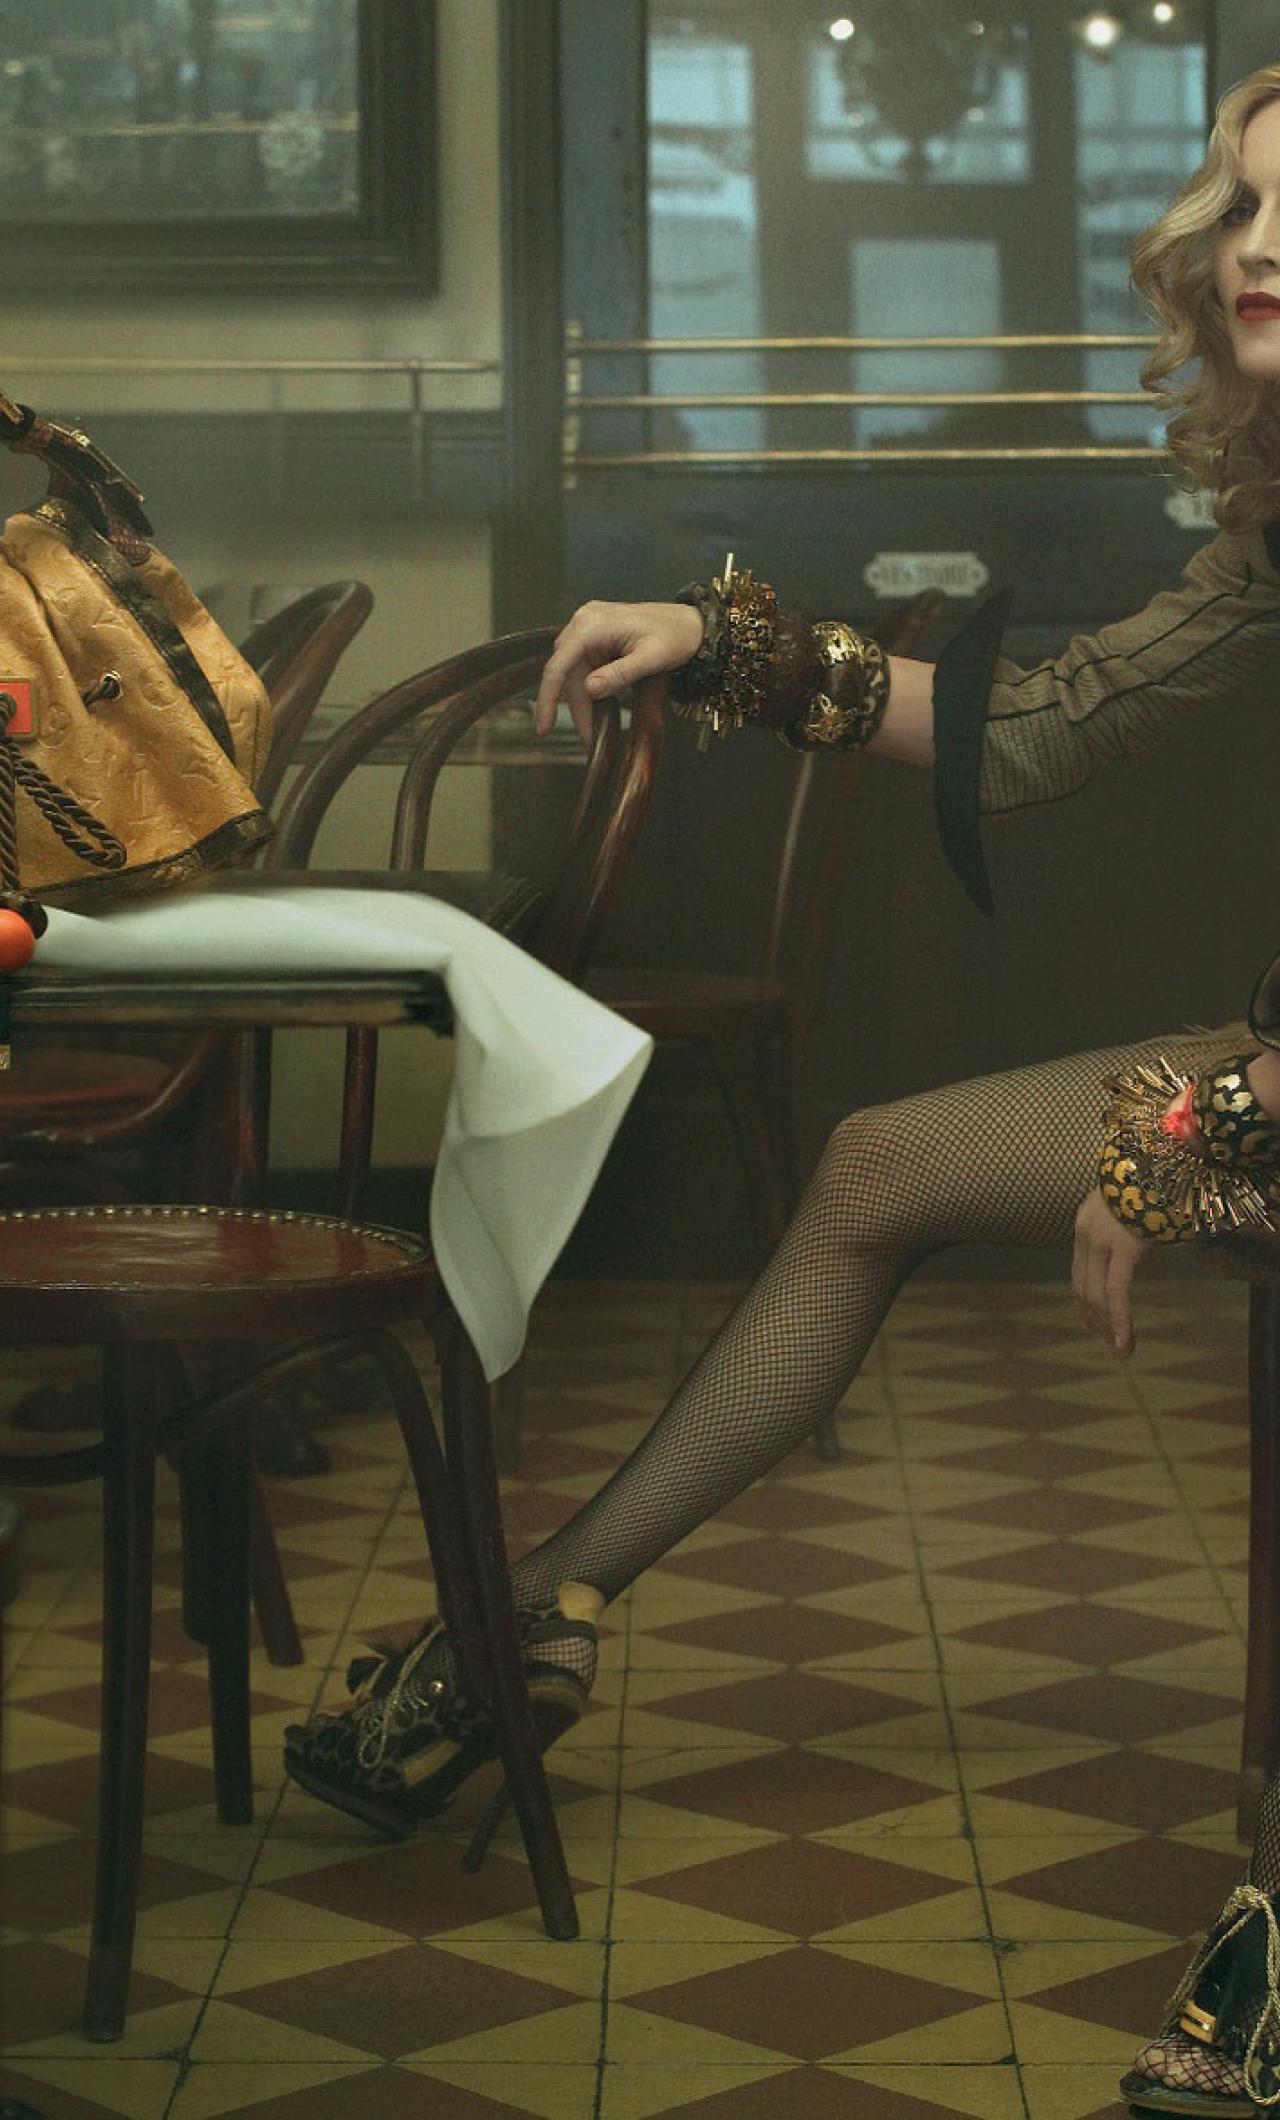 Madonna photoshoot full hd wallpaper - Madonna hd images ...